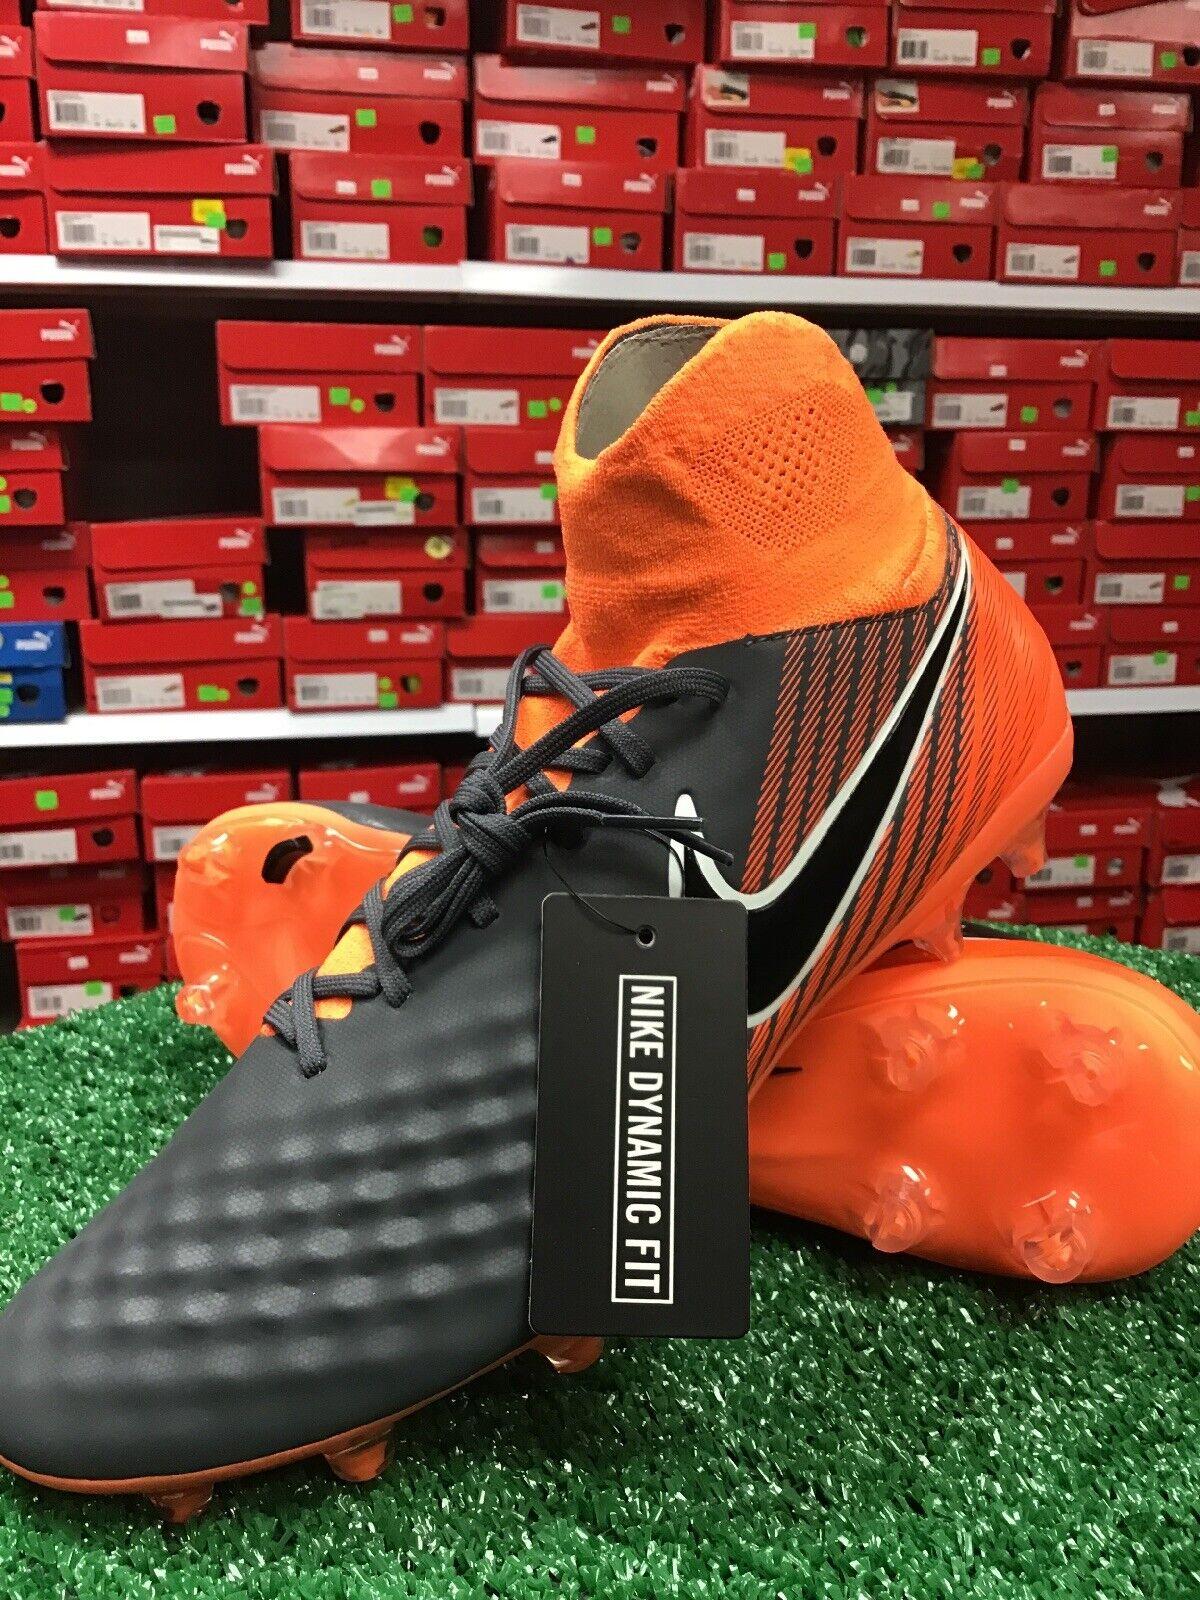 New Nike Obra 2 PRO DF FG Soccer Cleat grau   Orange Größe 11 New In Box